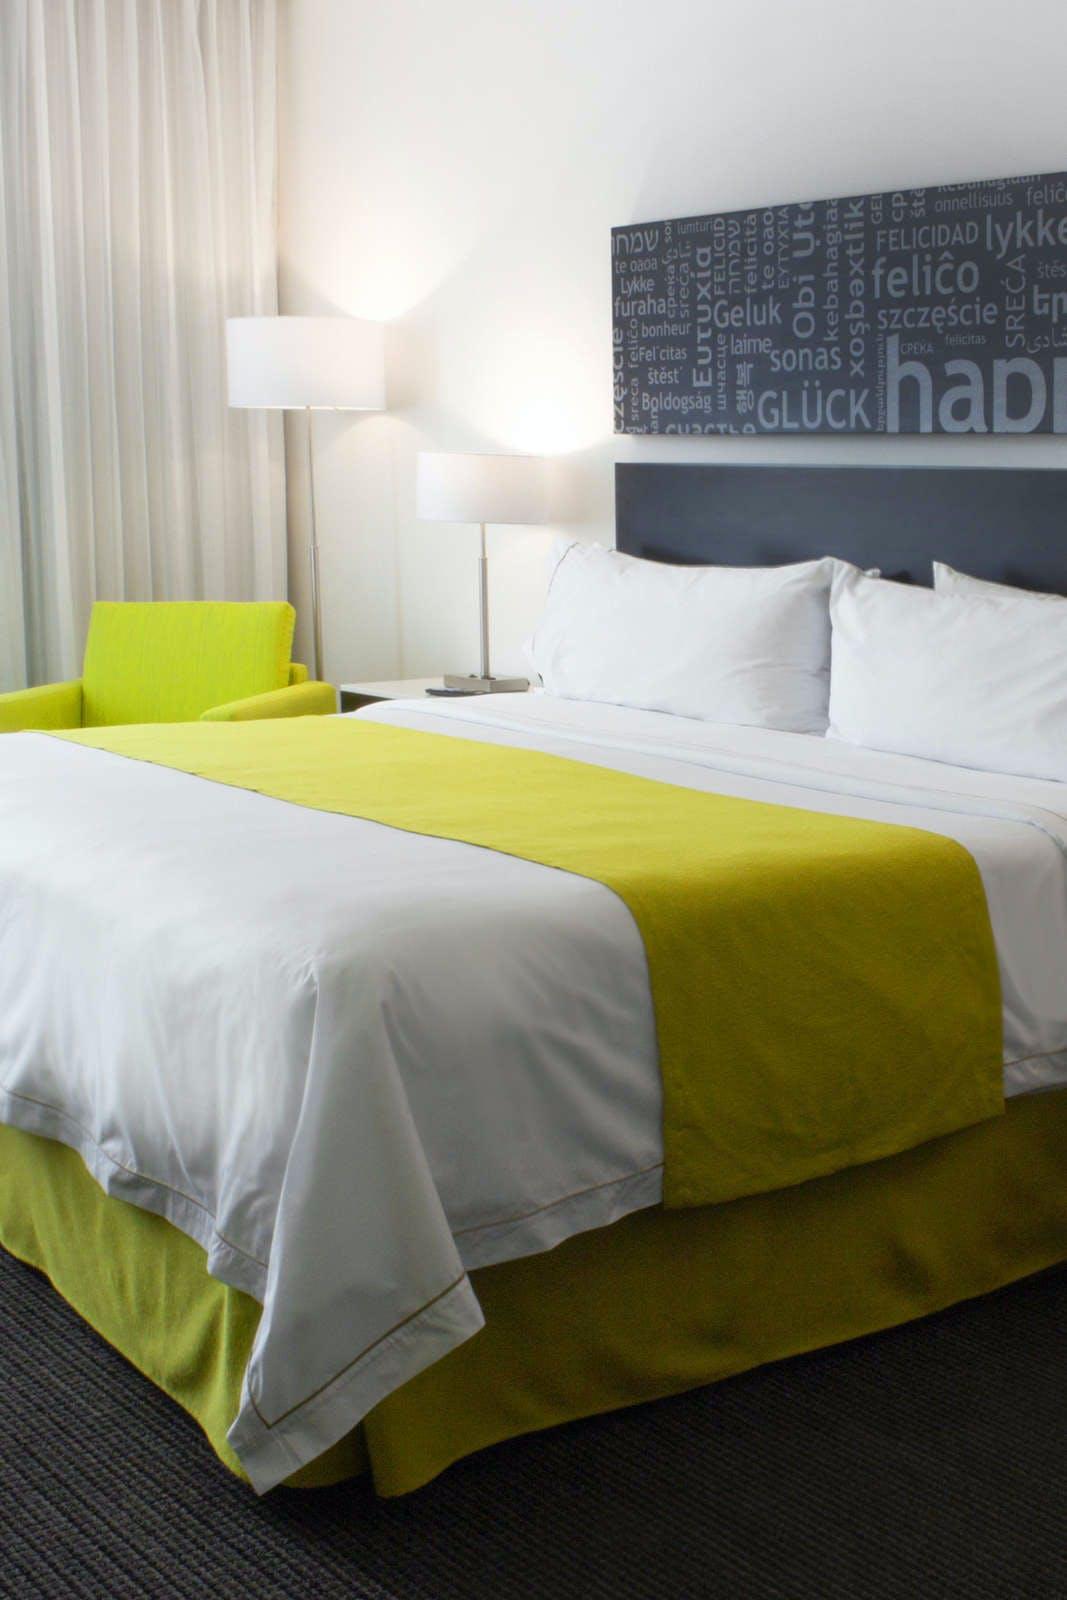 Holiday Inn Express & Suites Puebla Angelopolis